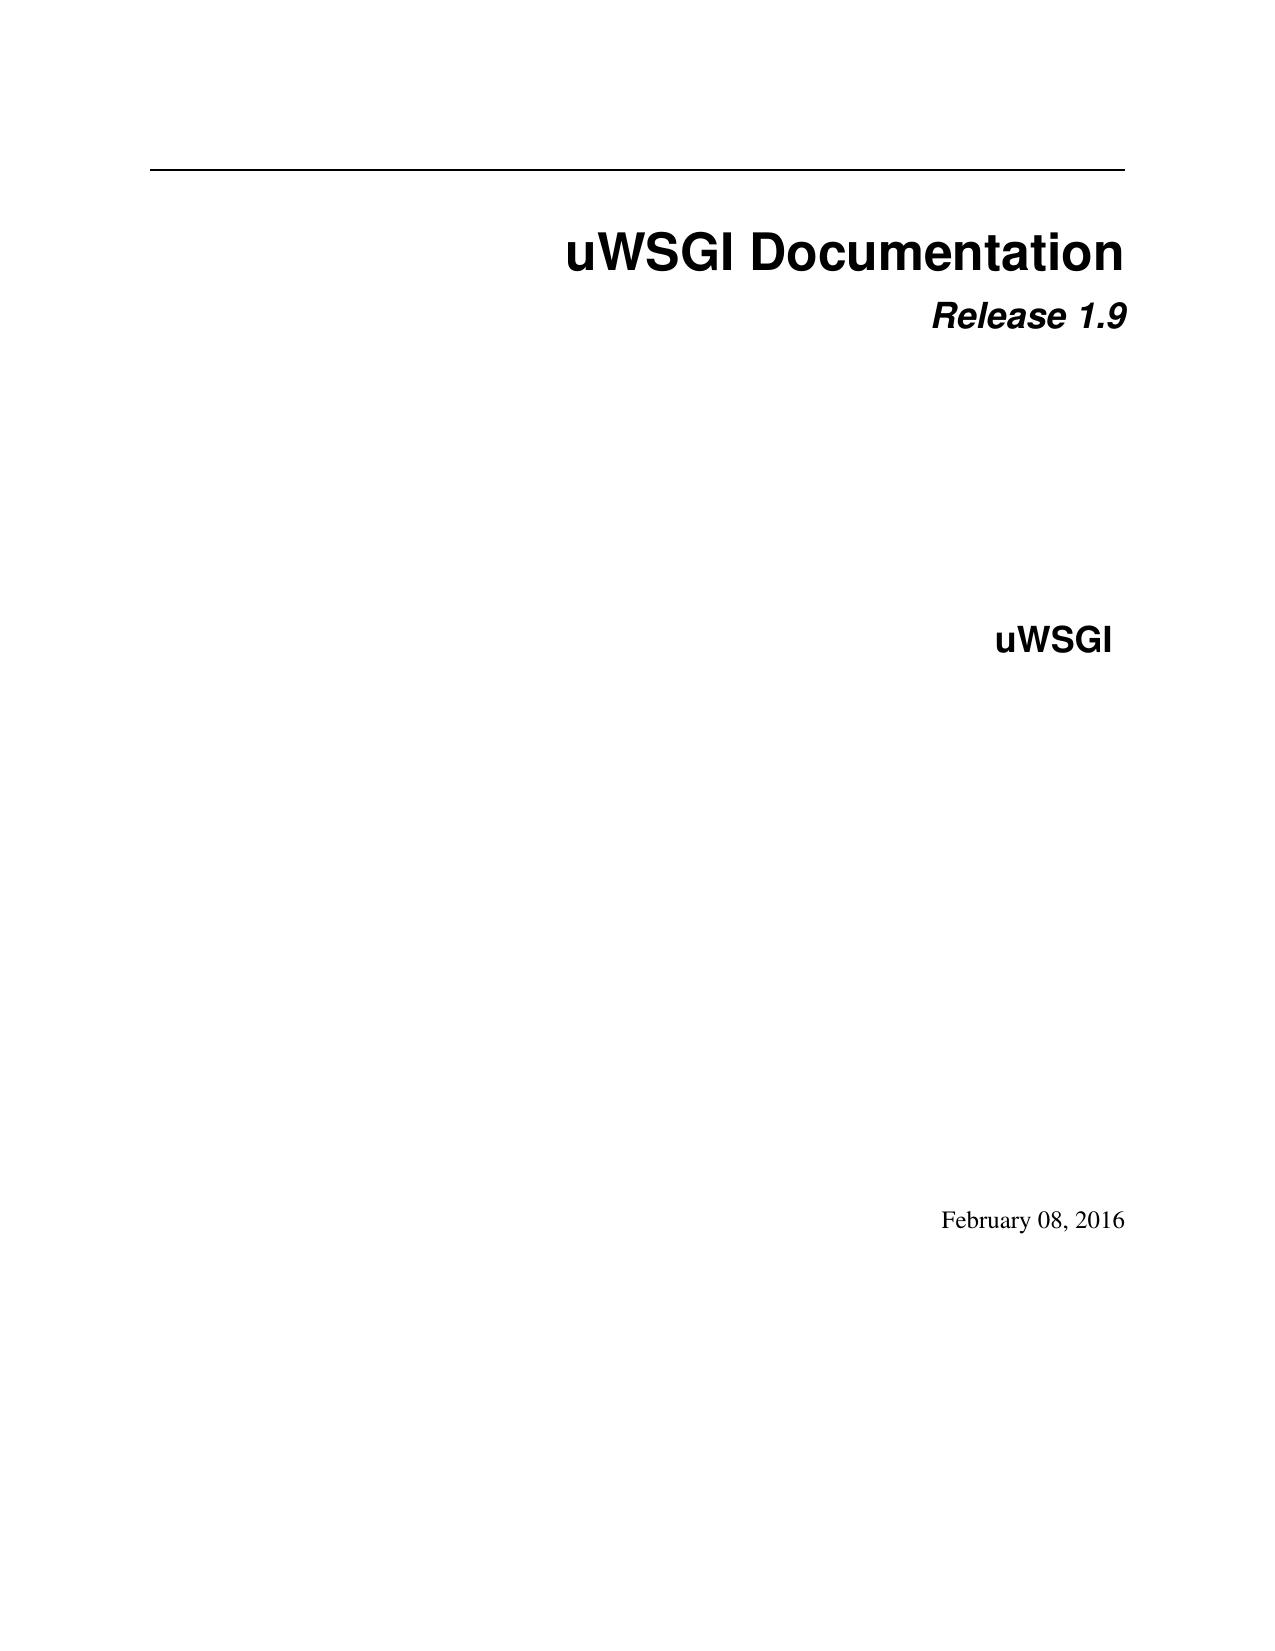 uWSGI Documentation | manualzz.com